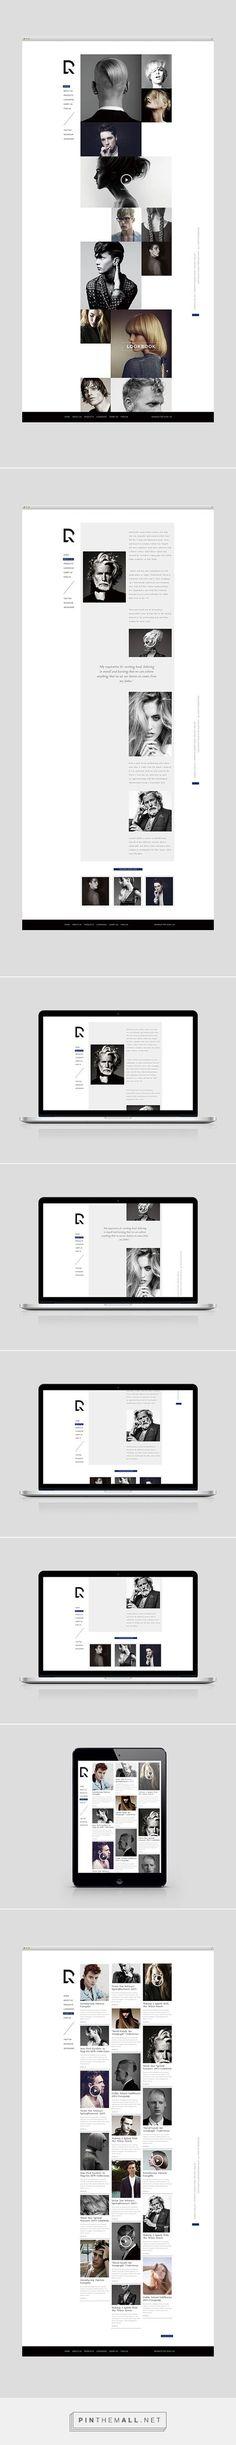 DRYRUN Boutique Luxury Hair Salon Web Design by Shou-Wei Tsai | Fivestar Branding Agency – Design and Branding Agency & Curated Inspiration Gallery